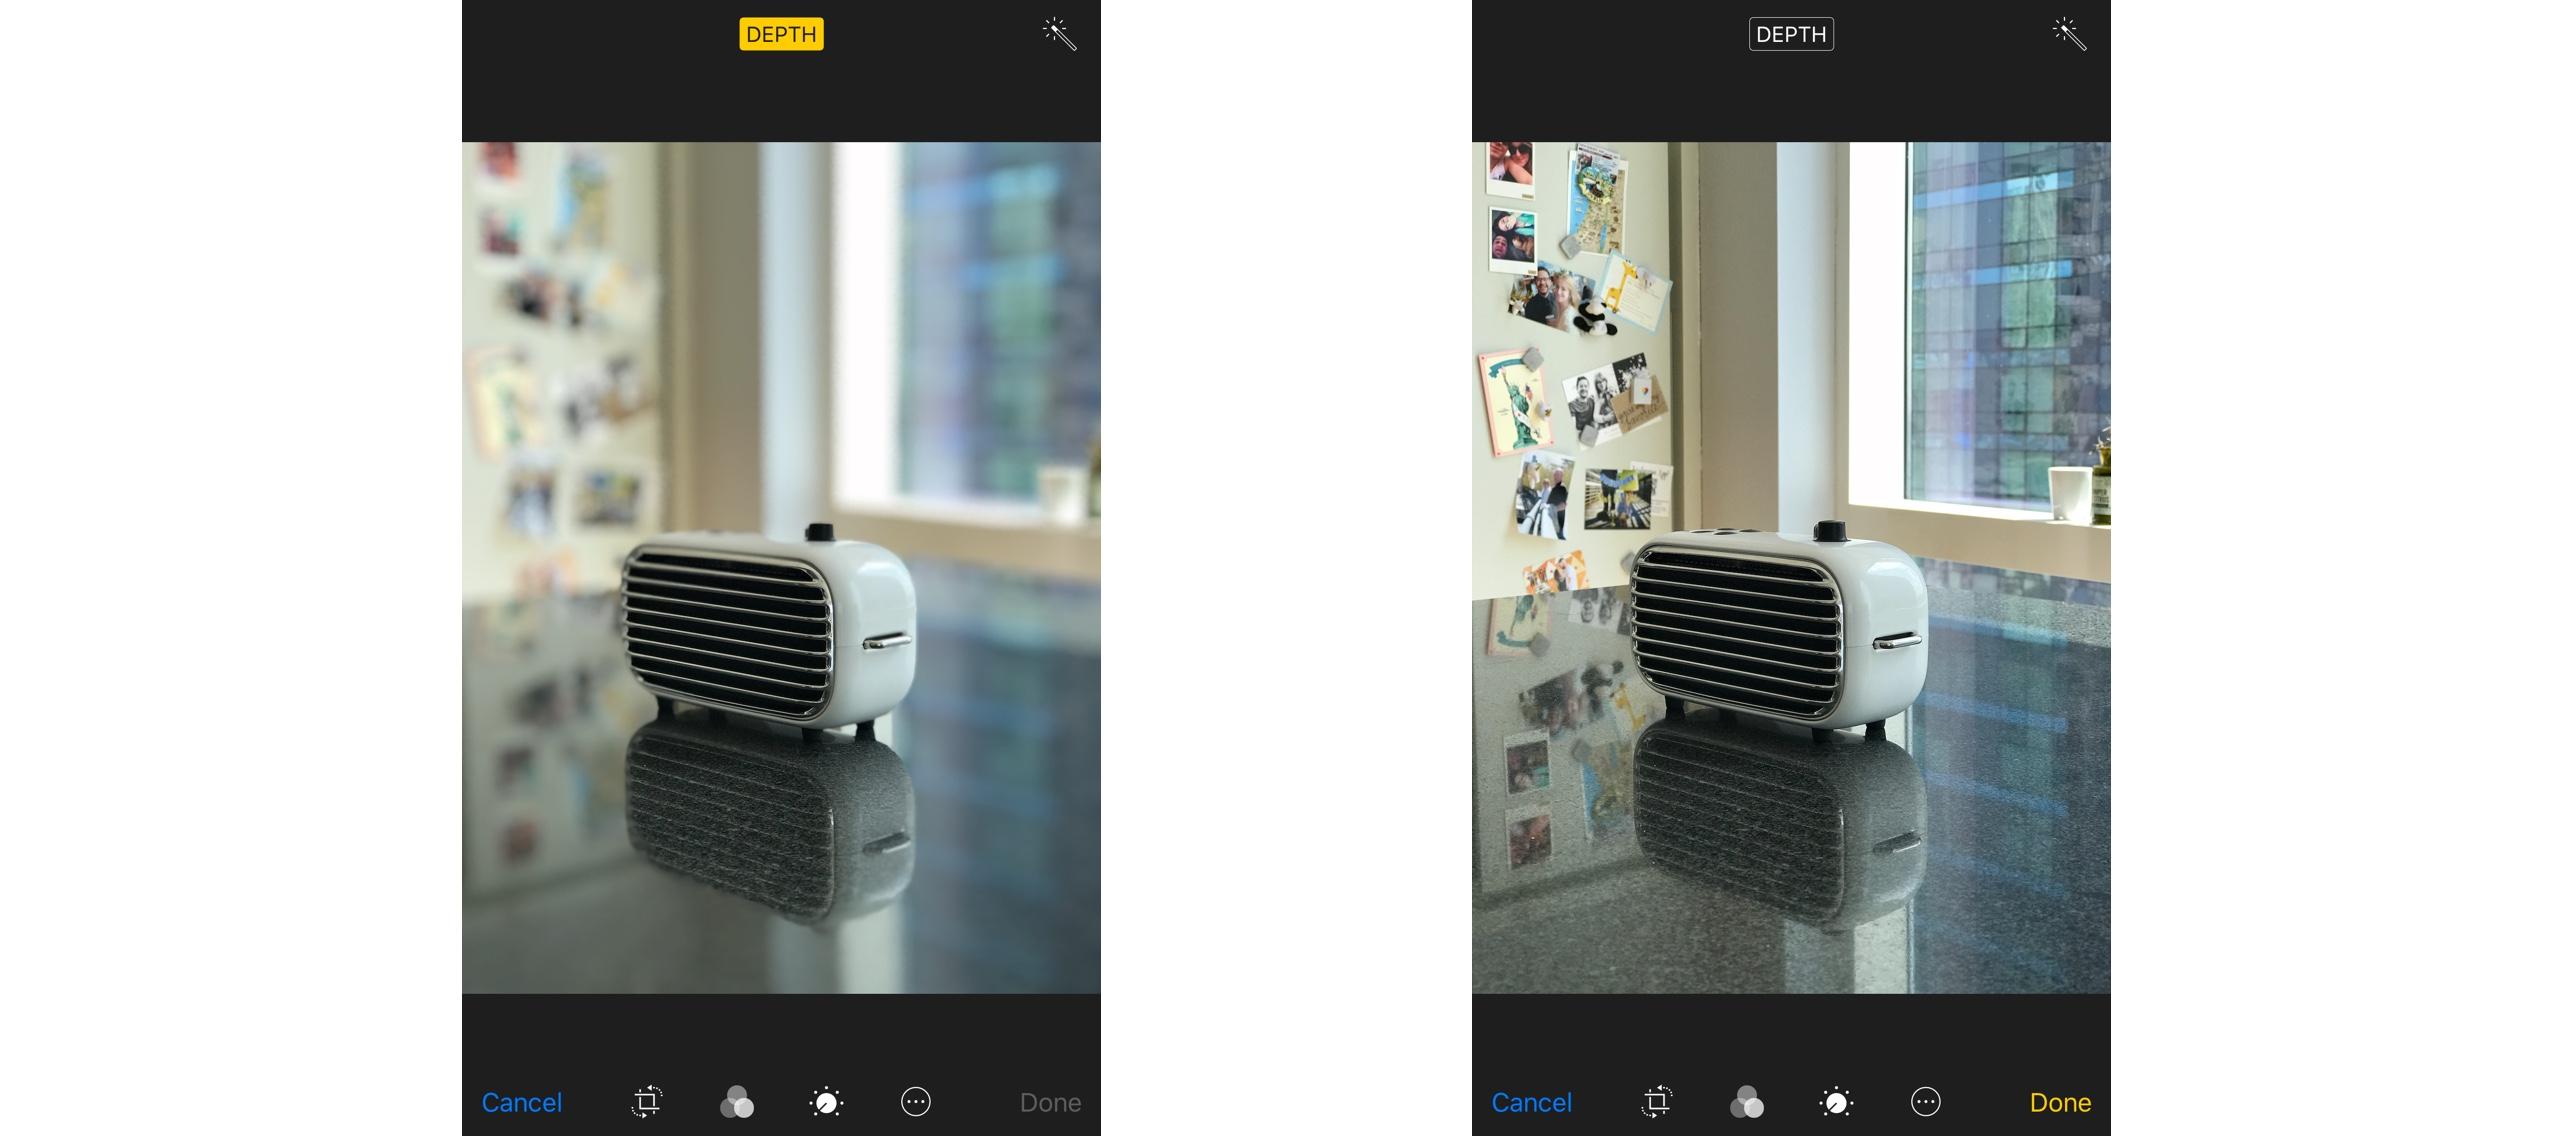 iOS 11 Editing Photo Depth Effect